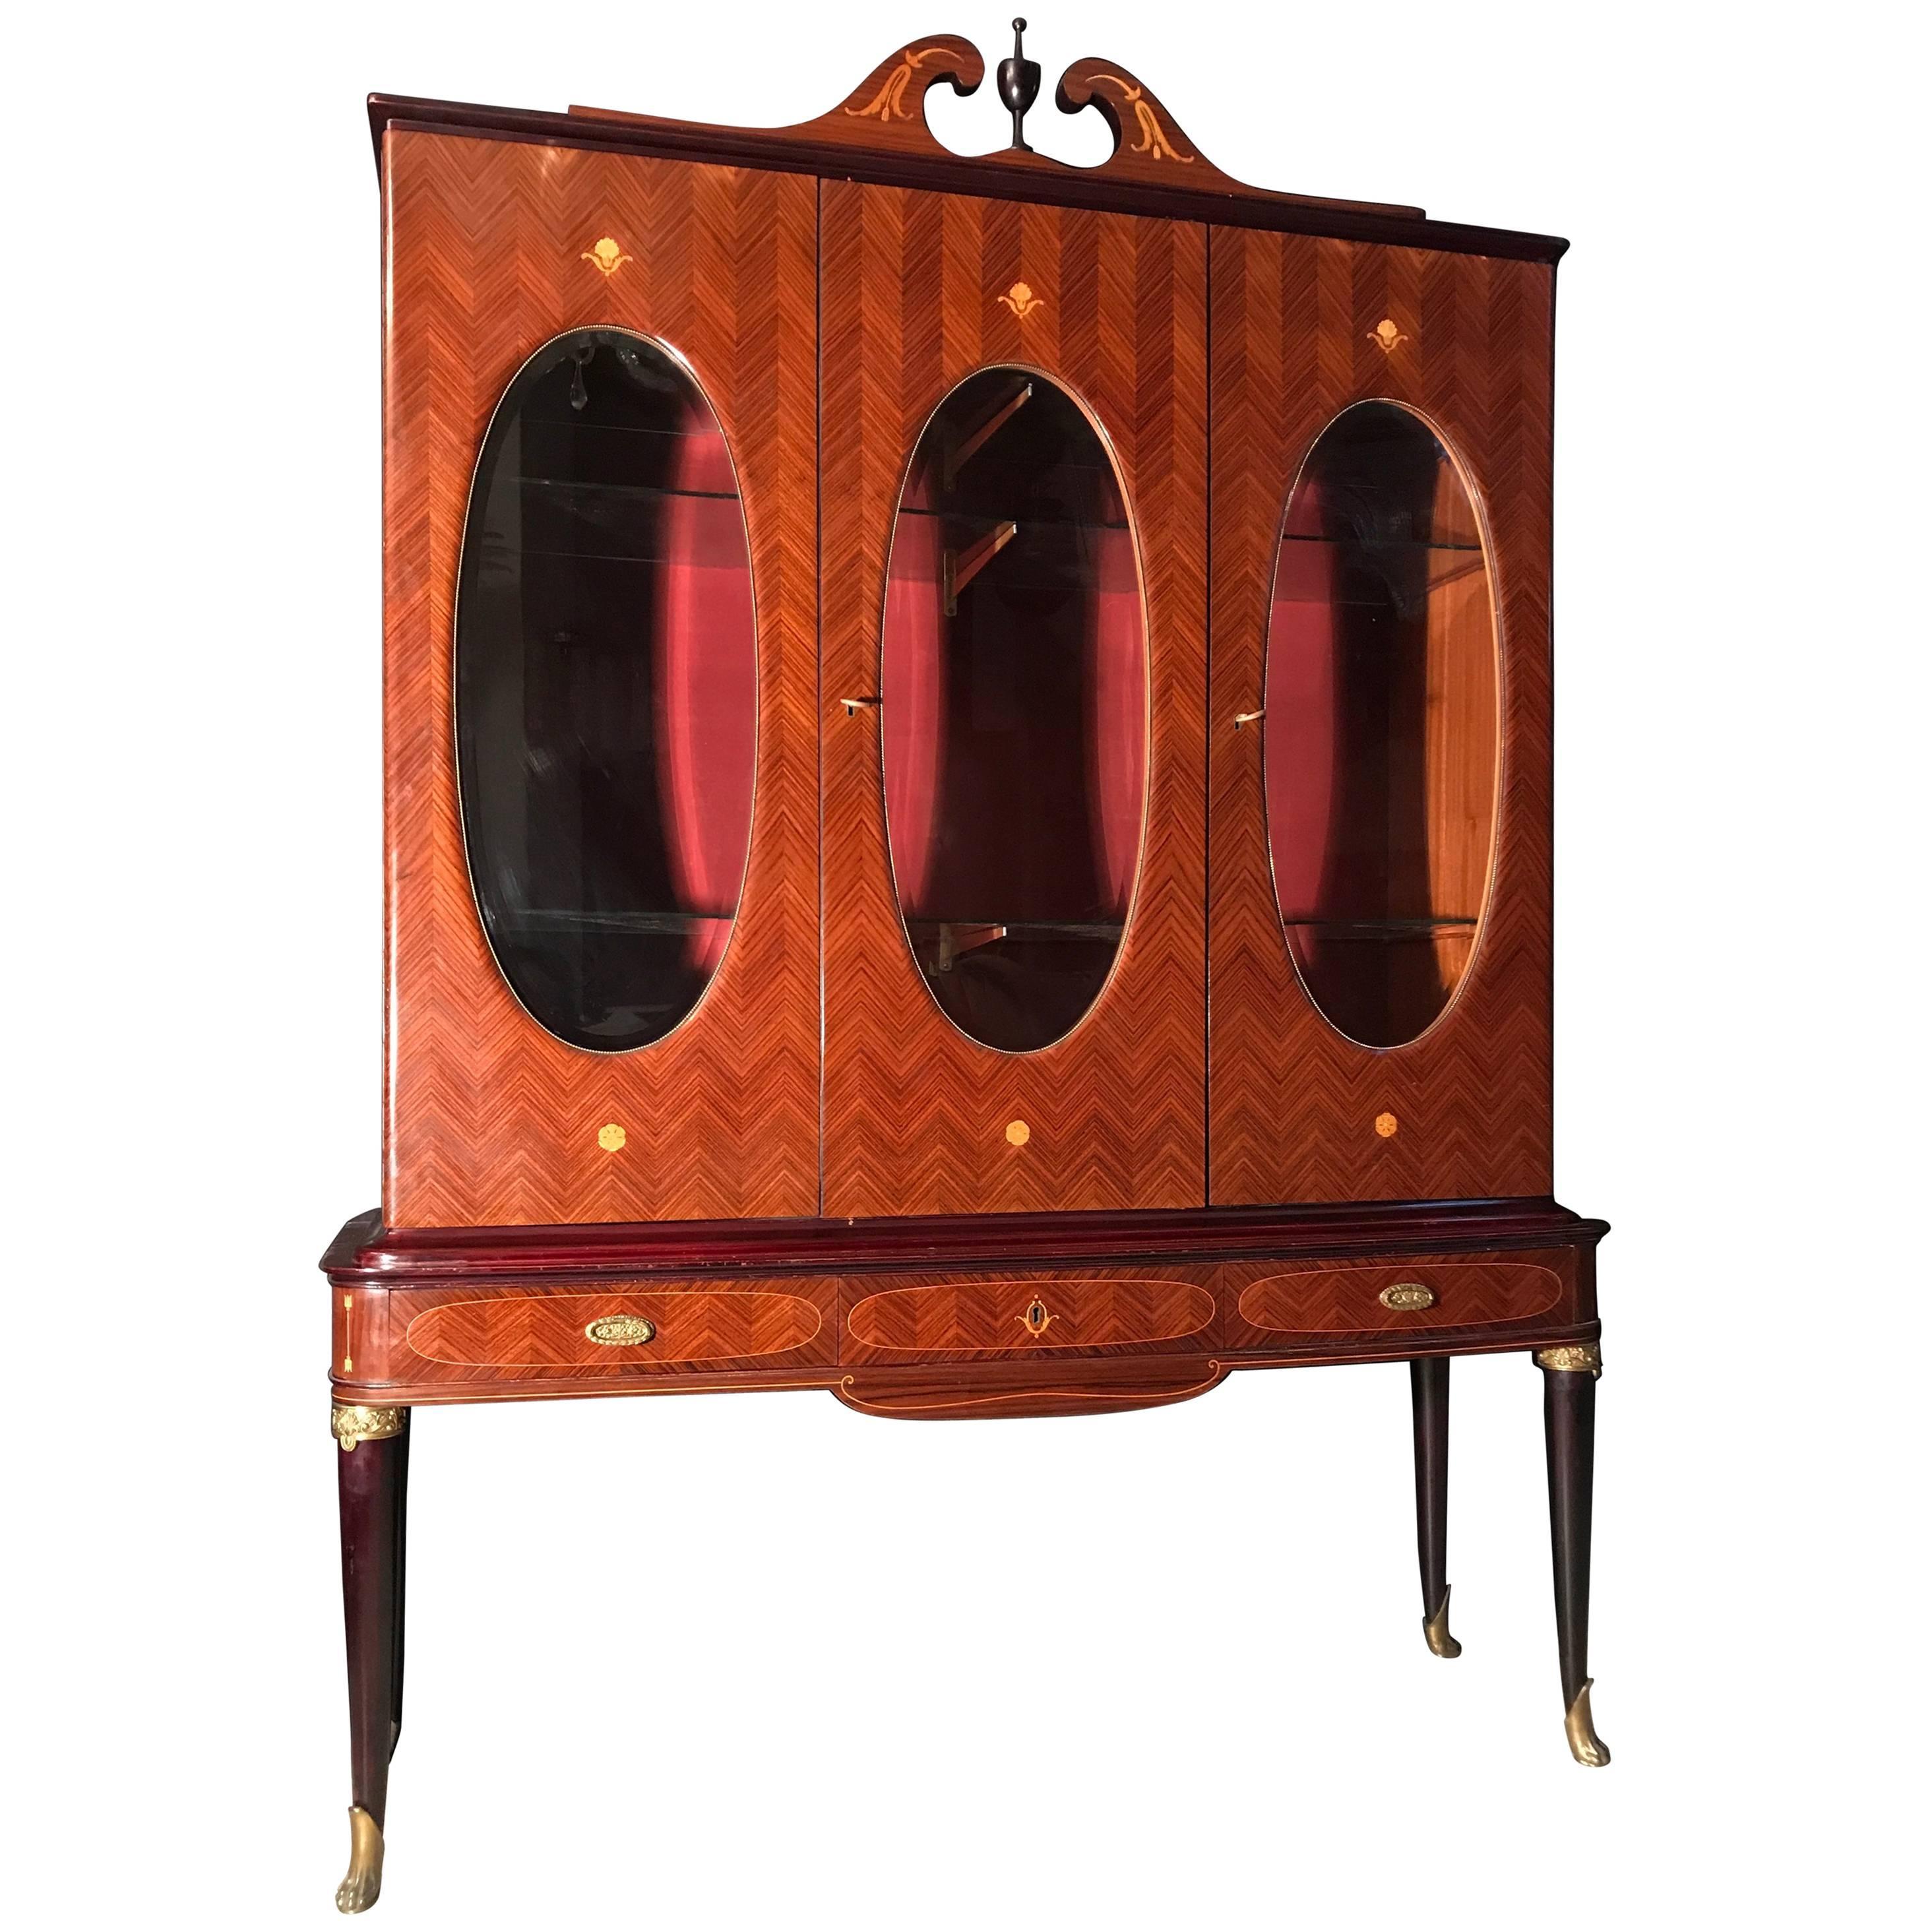 Italian Design Midcentury Cabinet Vitrine Attributed to Paolo Buffa